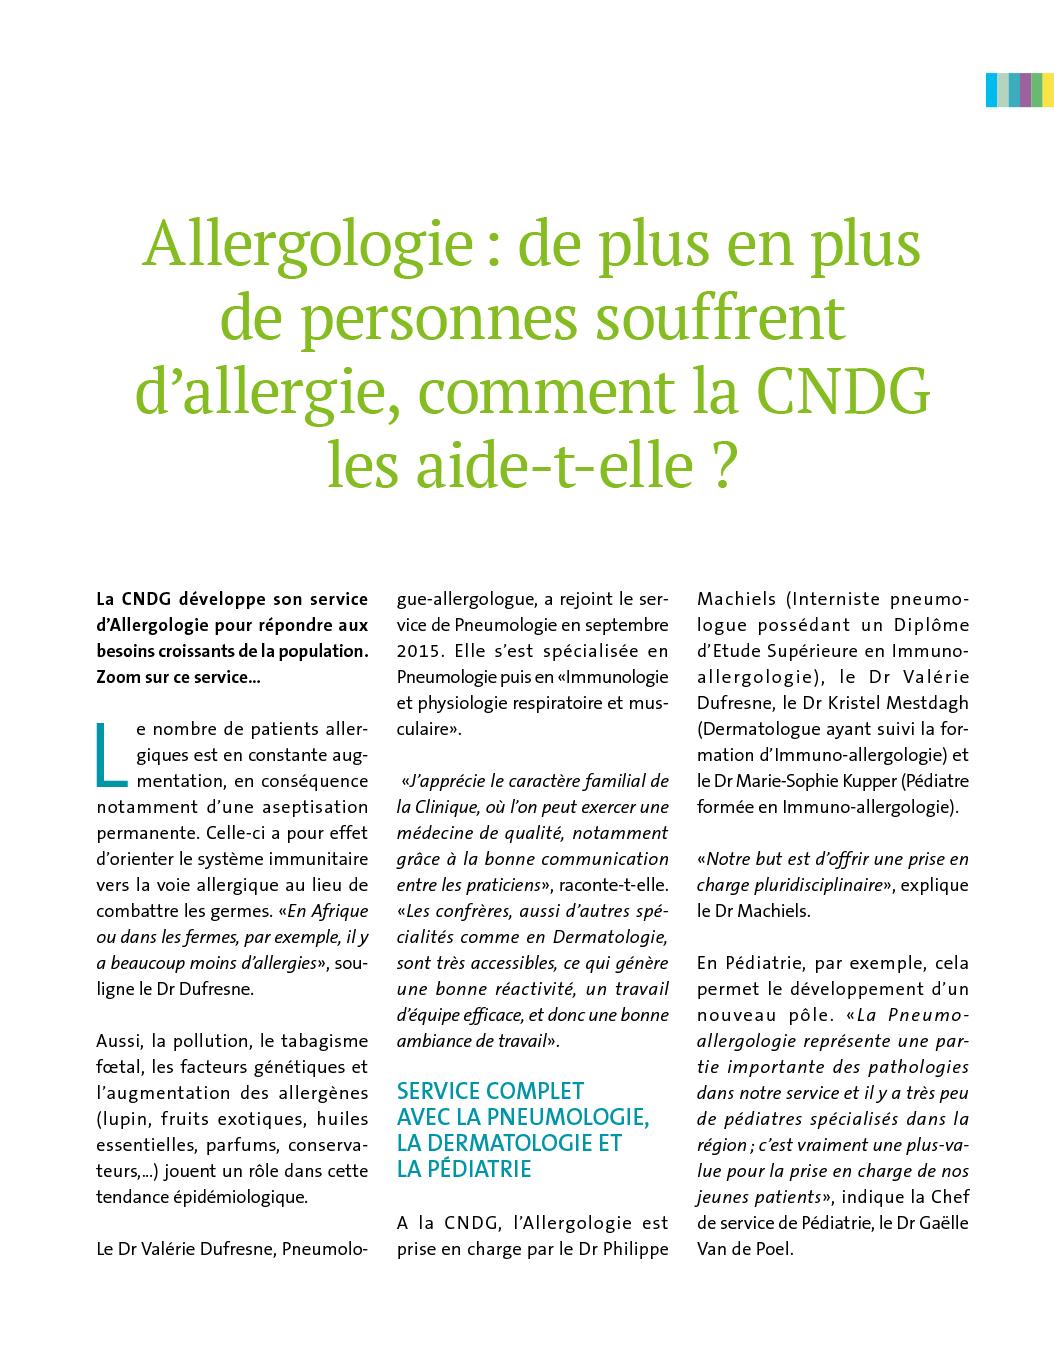 cndg_rapportactivites_2015_extrait_allergologie-1